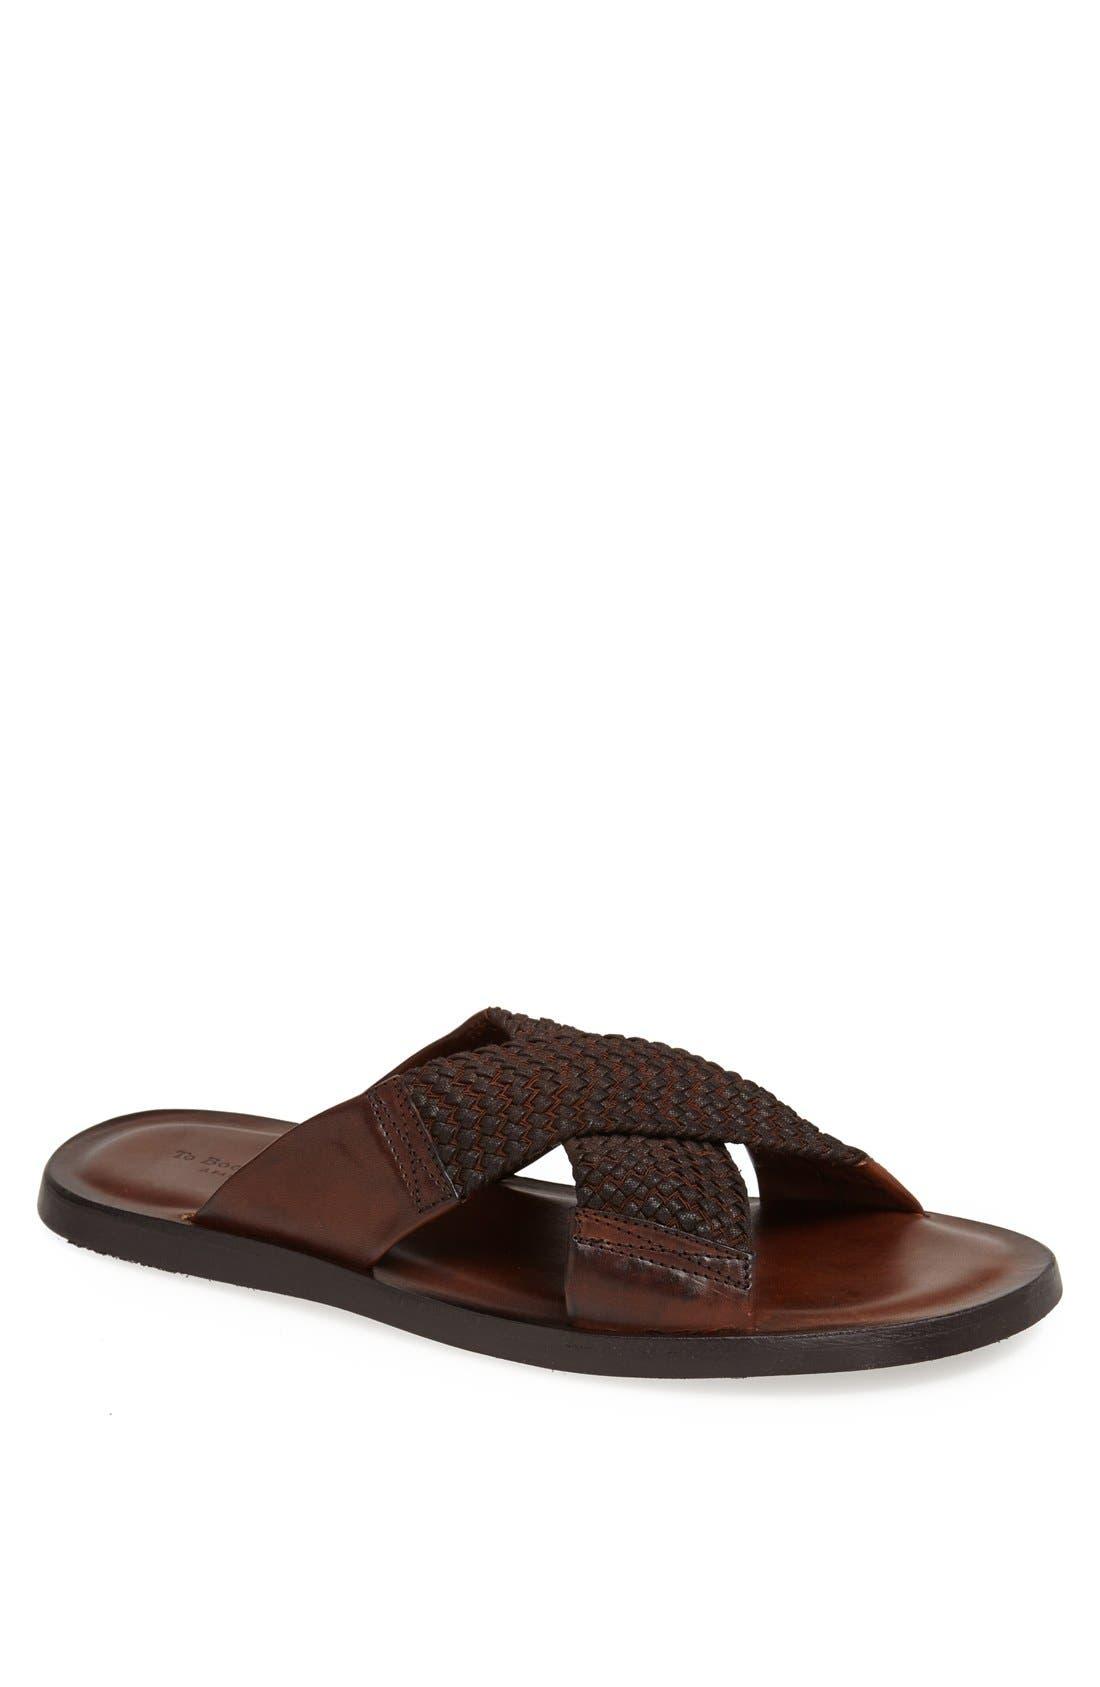 Alternate Image 1 Selected - To Boot New York 'Ibiza' Leather Slide Sandal